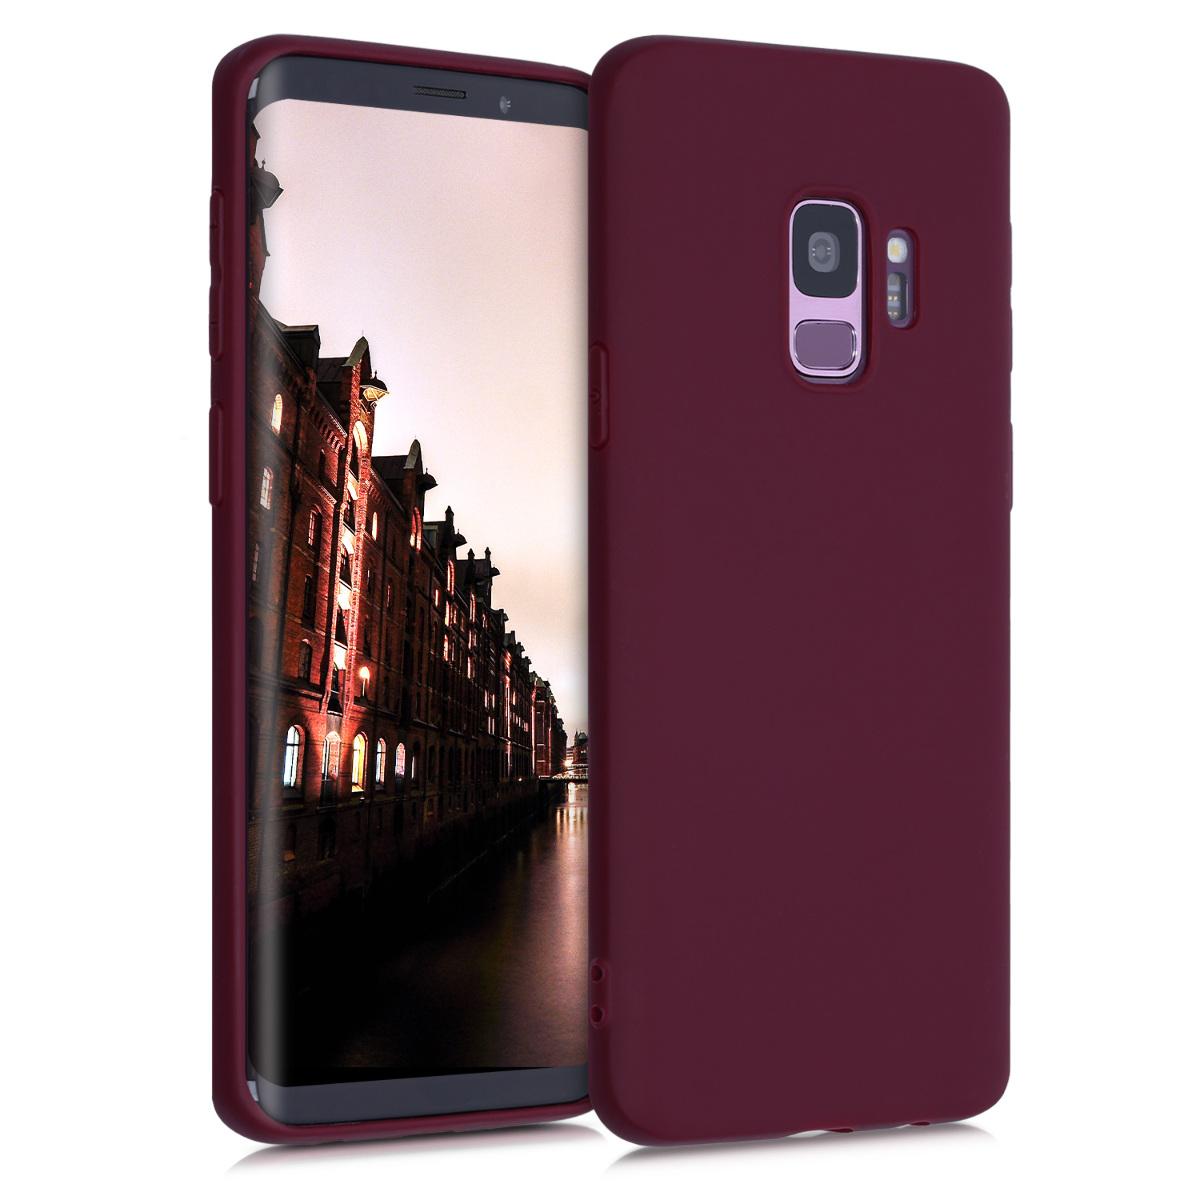 TPU Silikonové pouzdro pro Samsung Galaxy S9 - Soft Flexible Protective Phone Cover - Bordeaux Violet